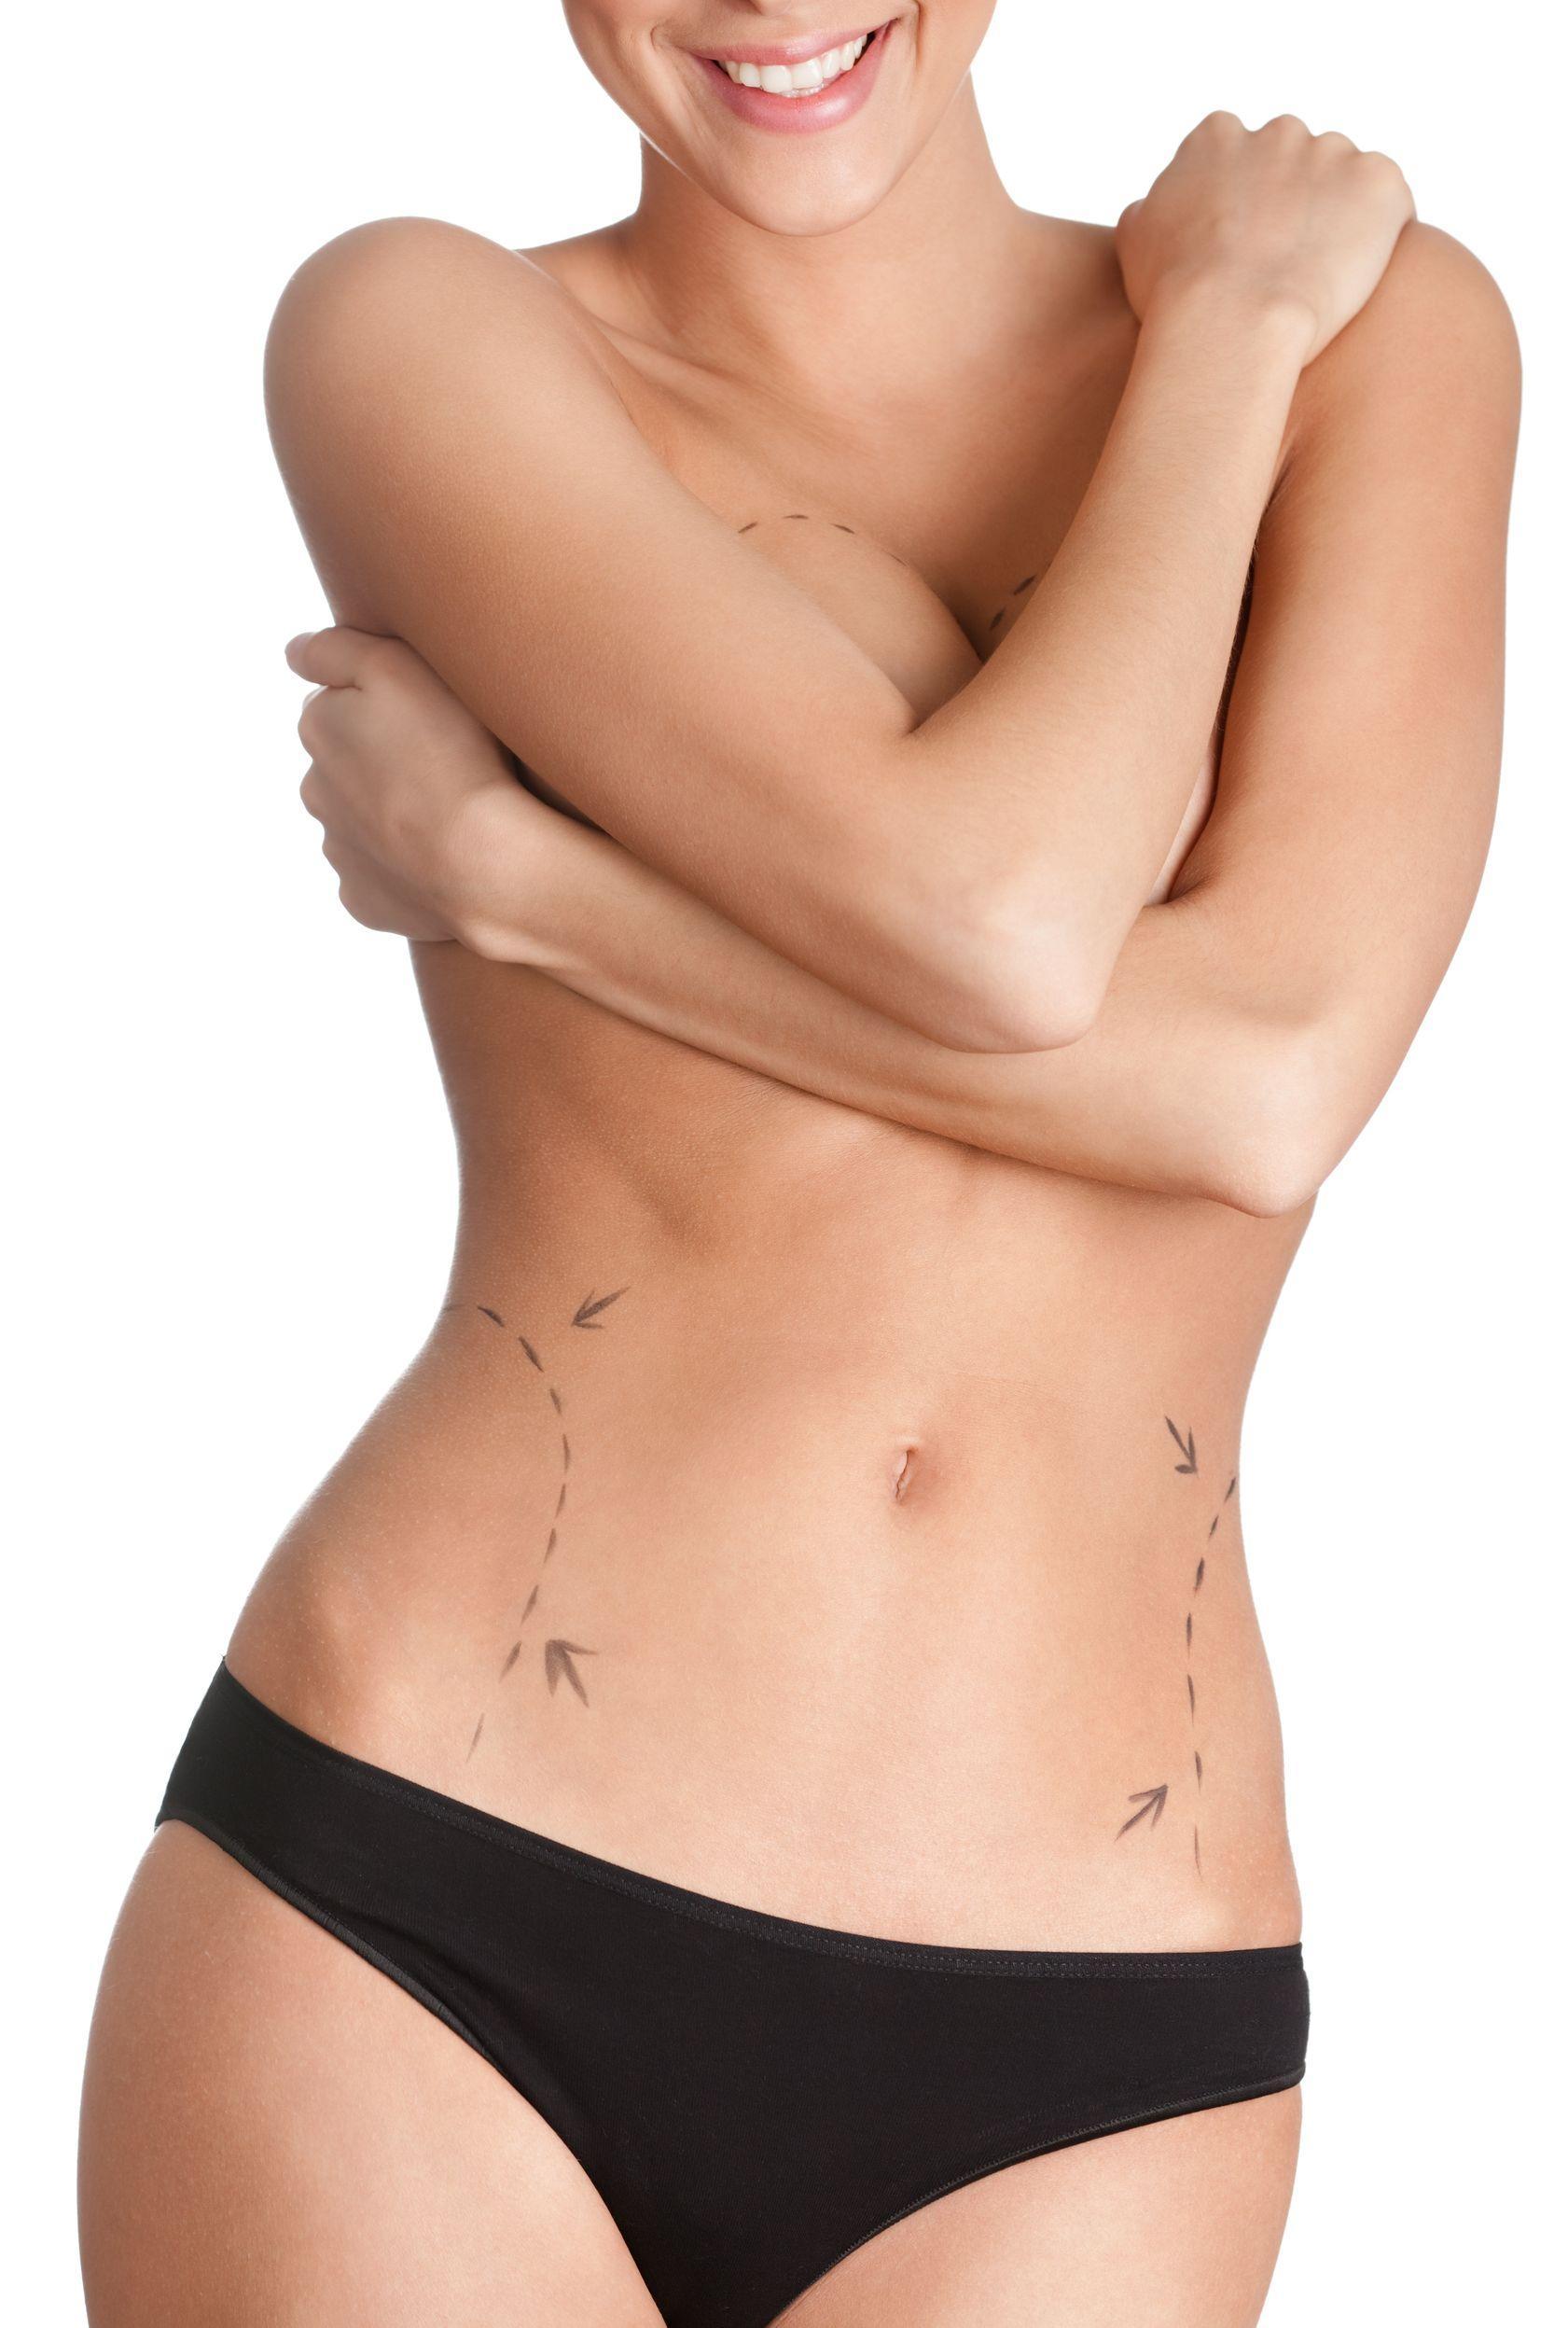 The Advantage of Laser Lipo for Skin Tightening